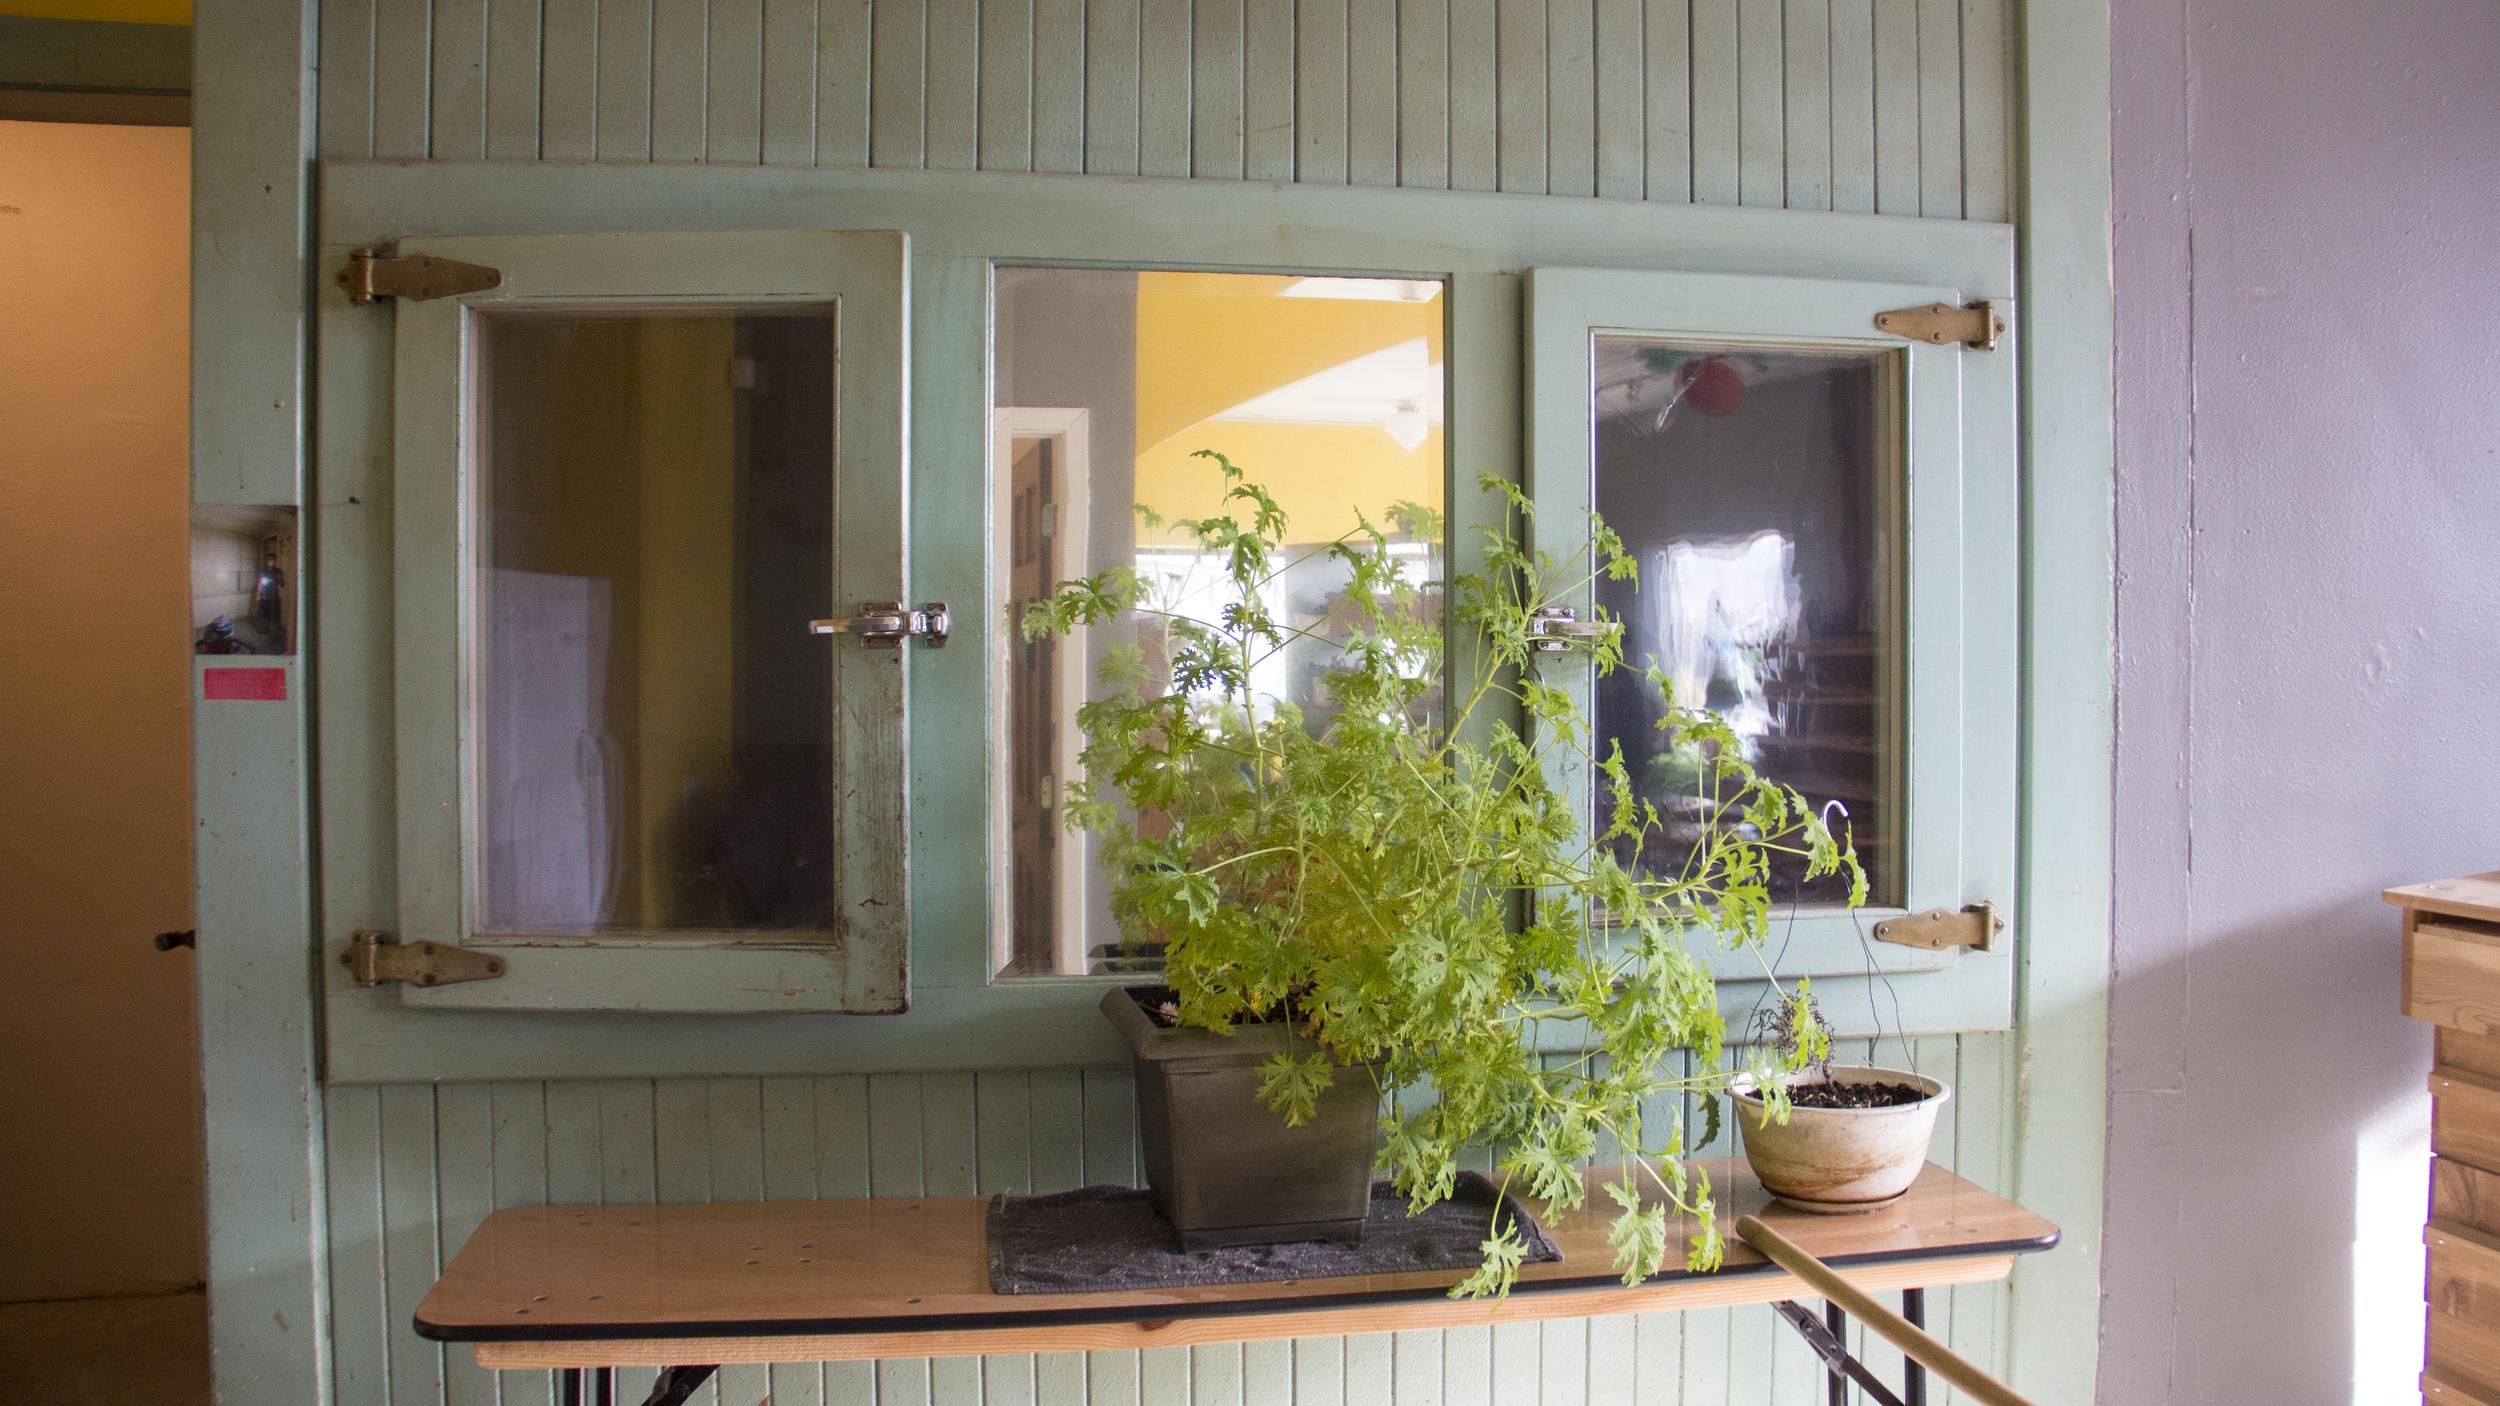 The mushroom incubator today, awaiting retrofit inside the Farmhouse.